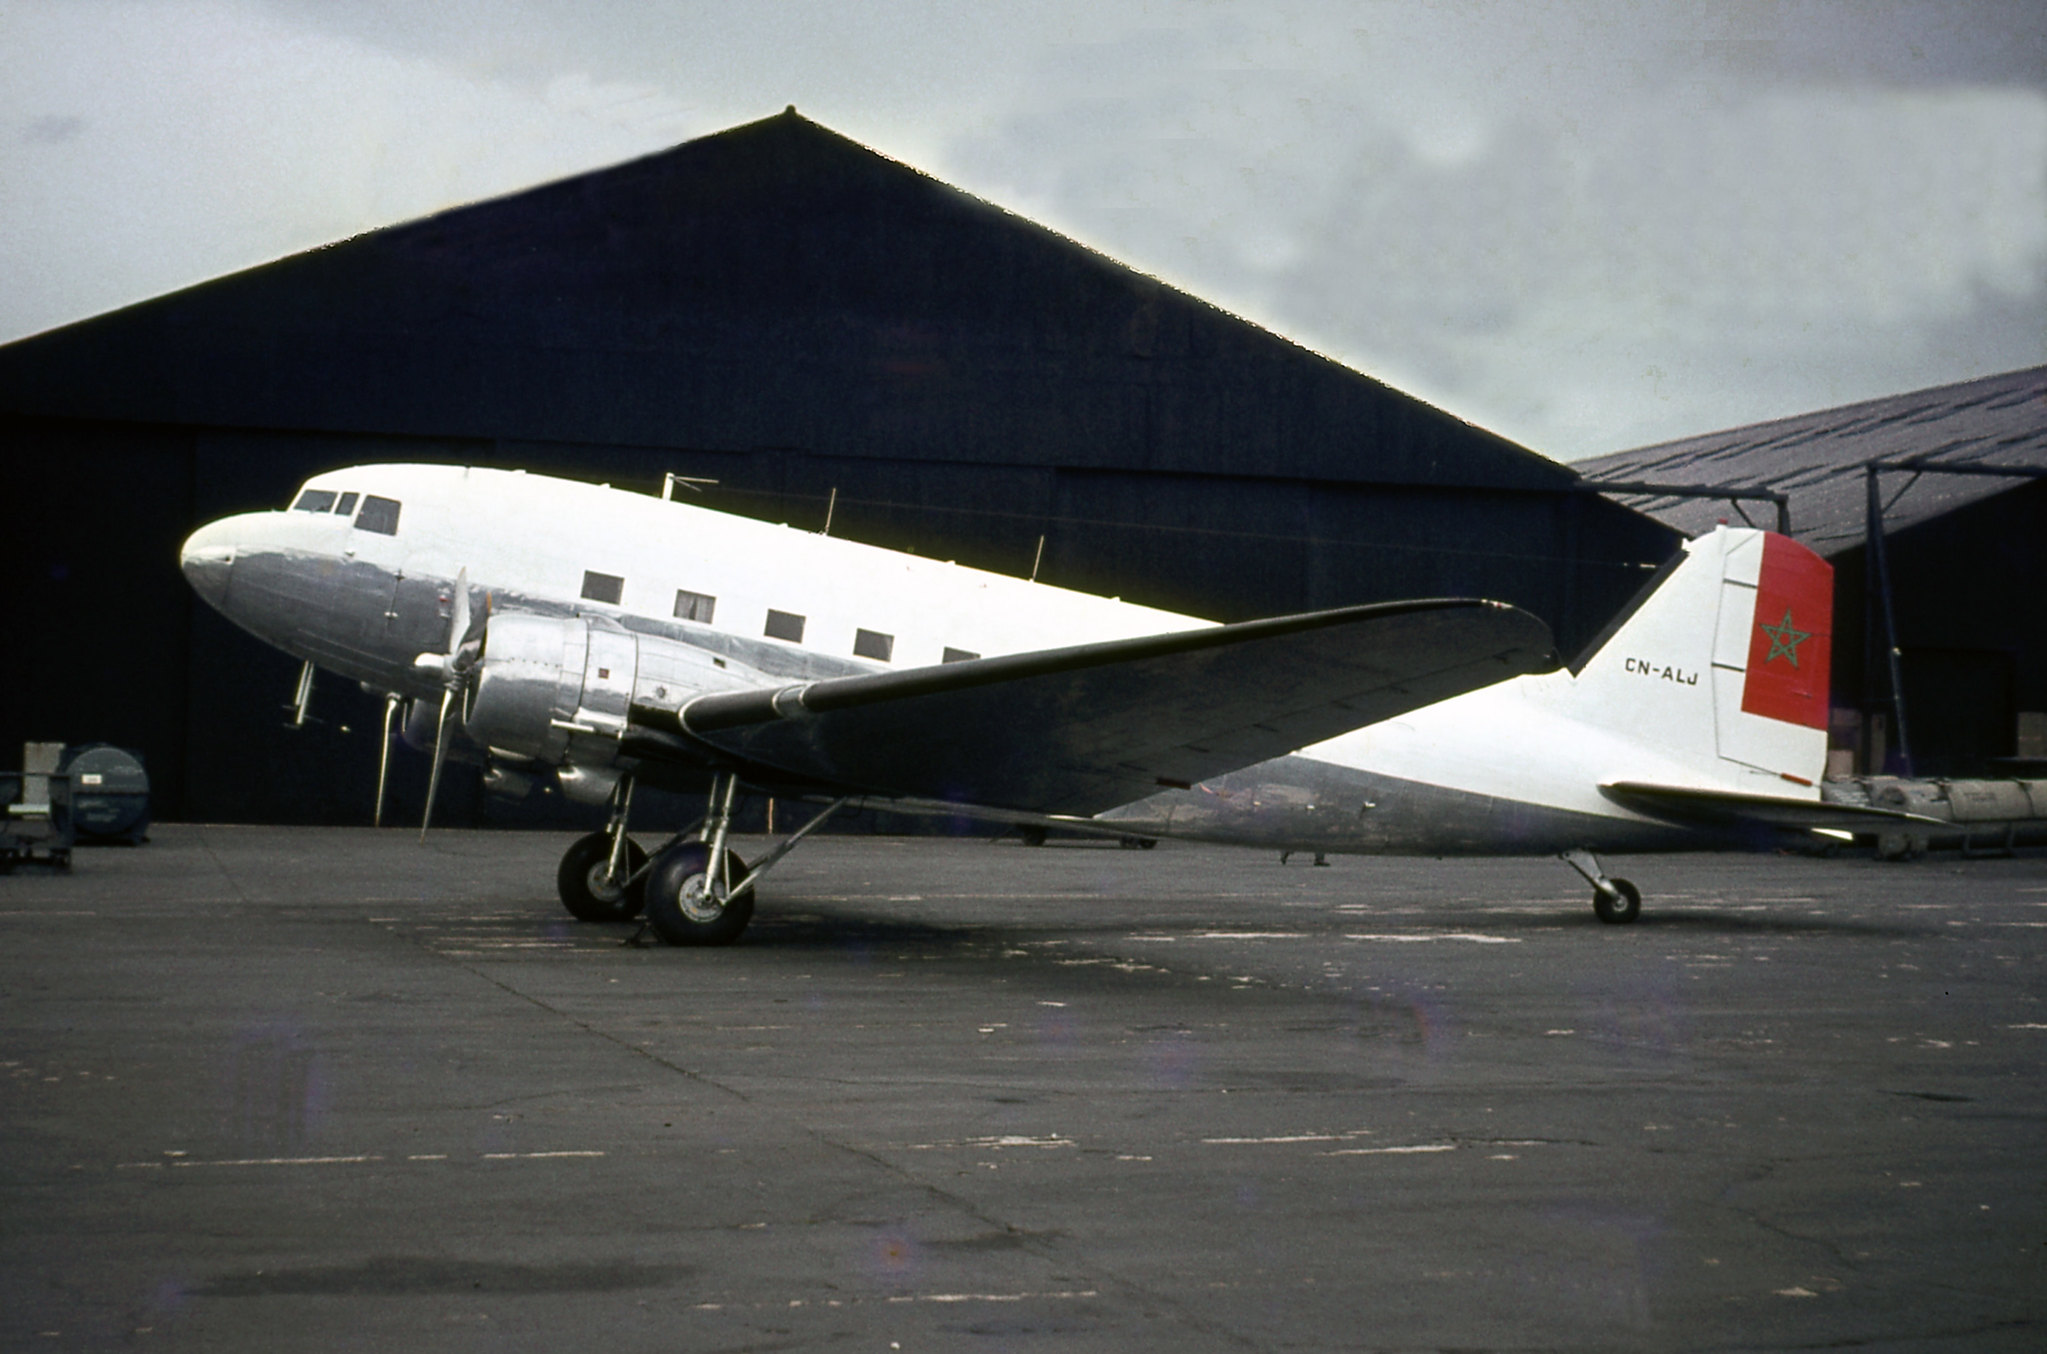 FRA: Photos anciens avions des FRA - Page 10 43552382940_cd97989d0a_k